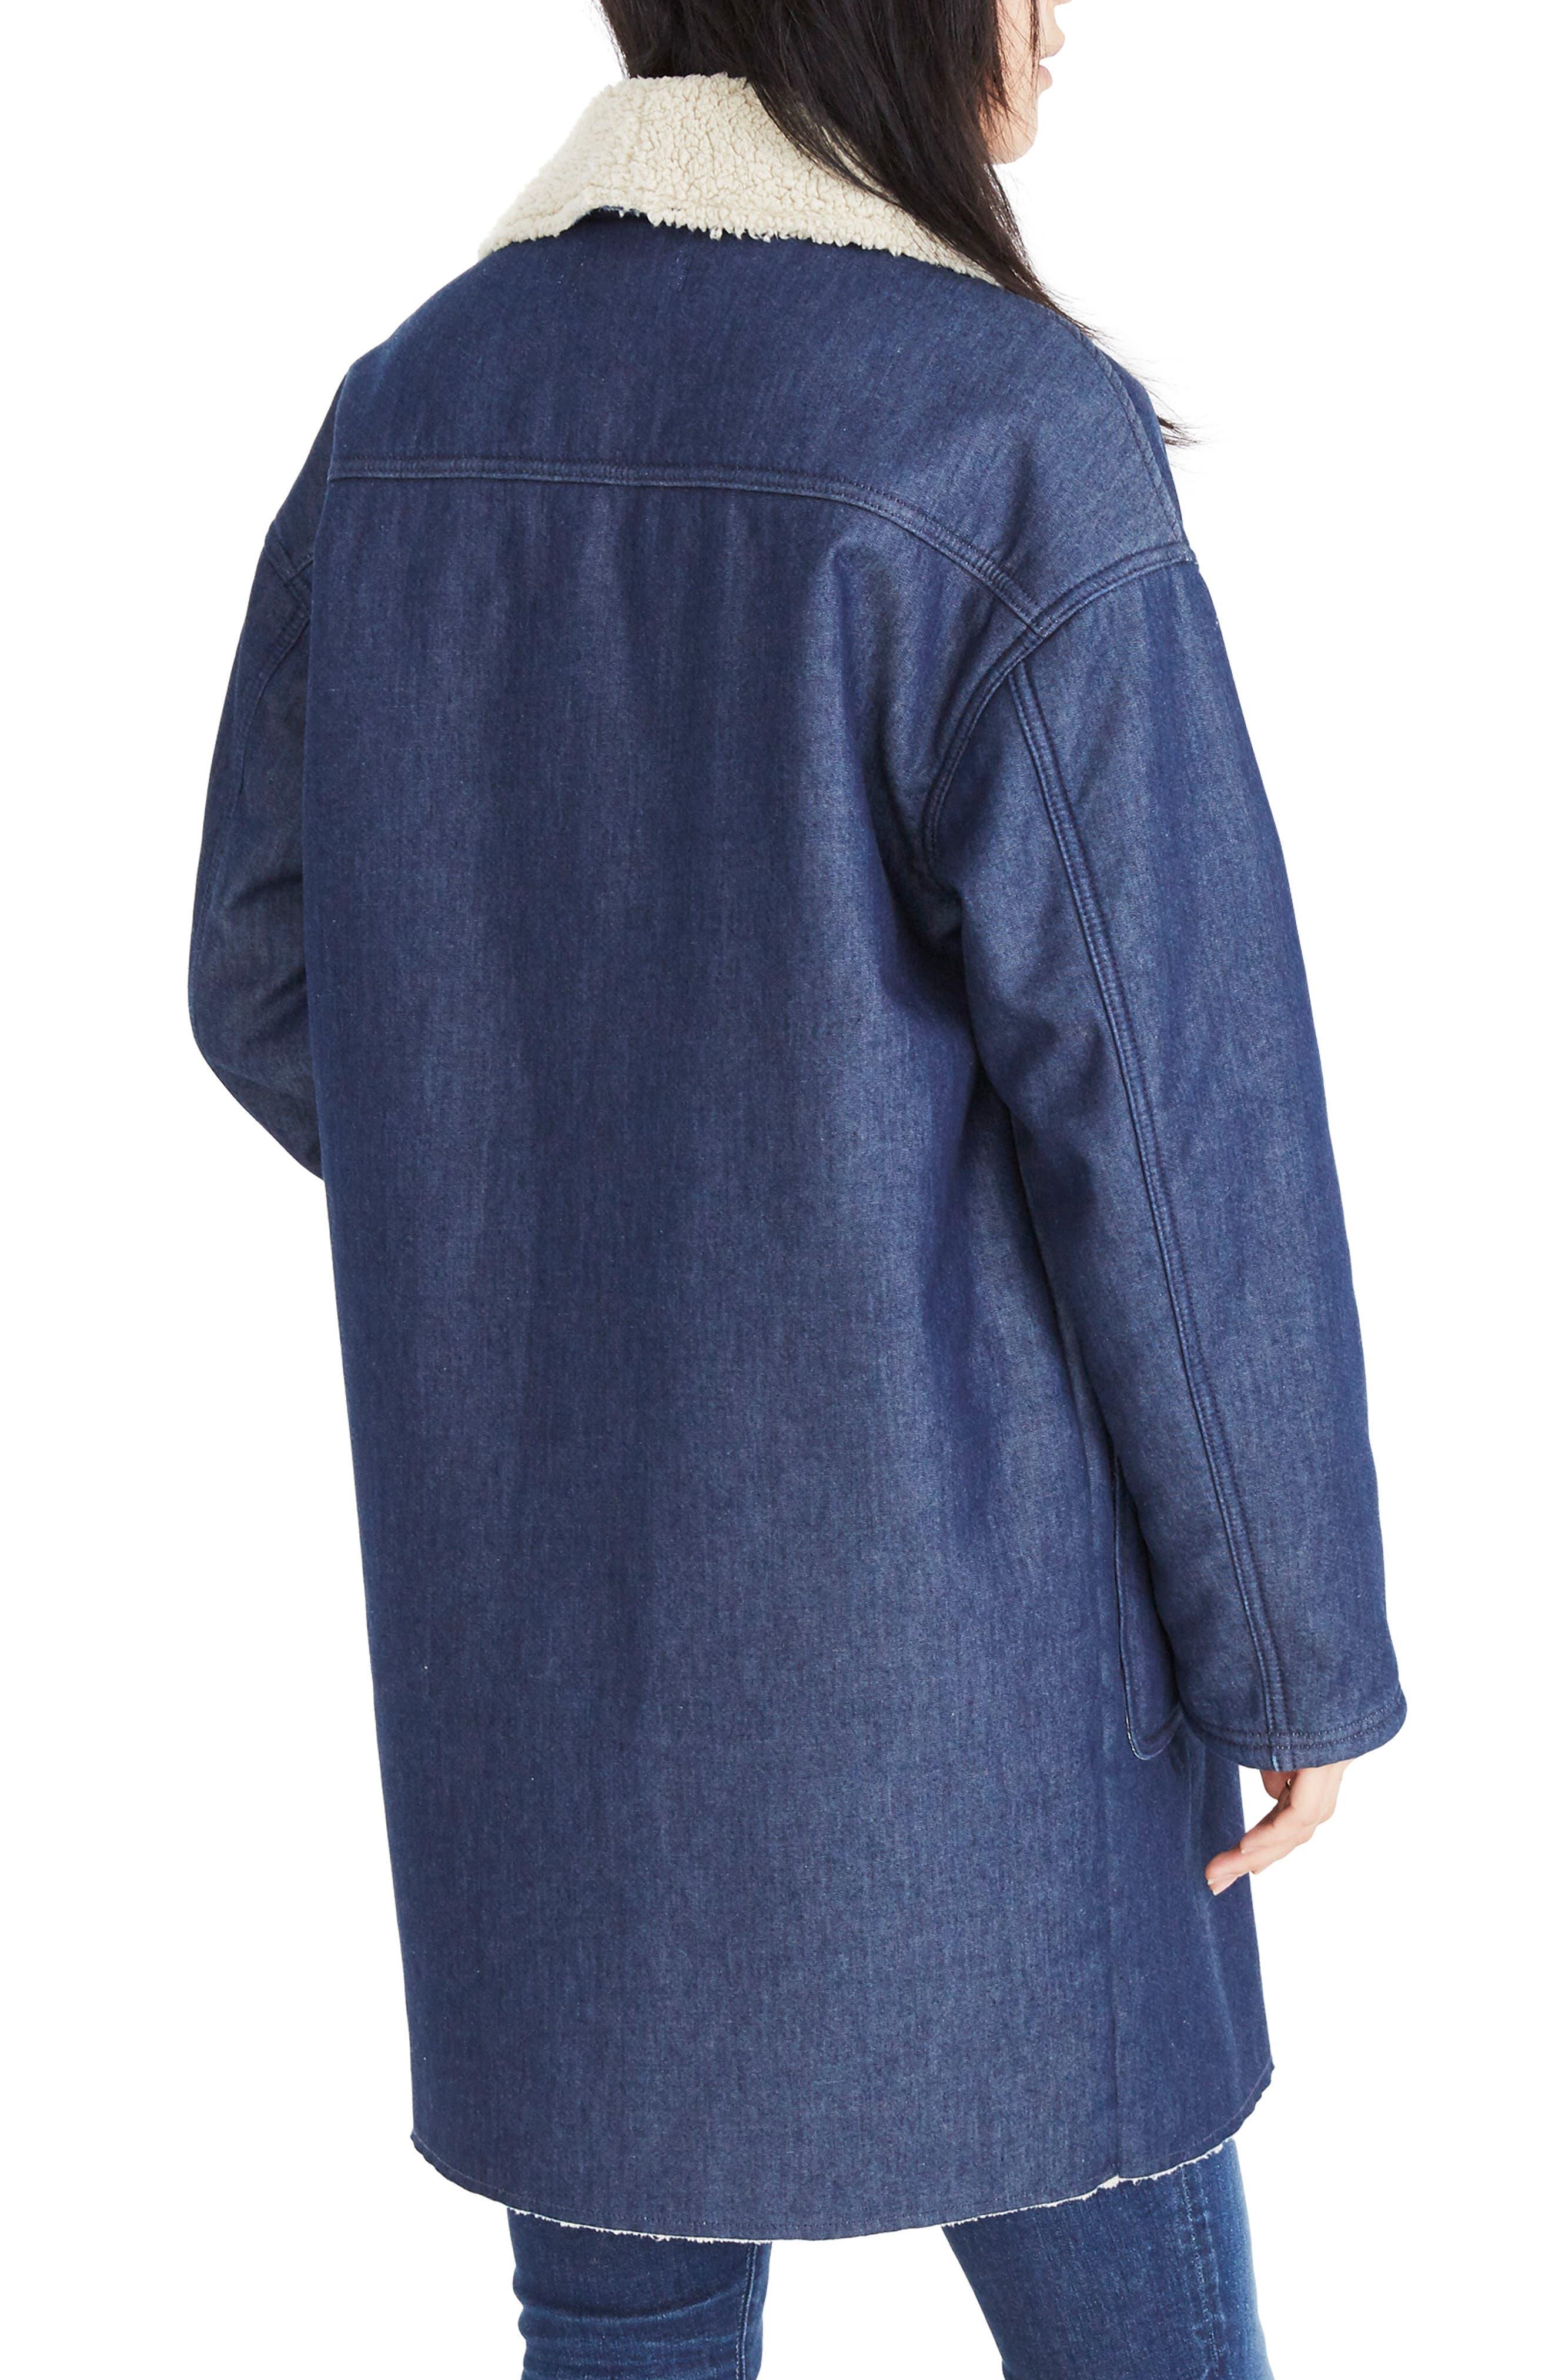 MADEWELL, Fleece Trim Denim Cocoon Coat, Alternate thumbnail 2, color, BRUNSWICK WASH